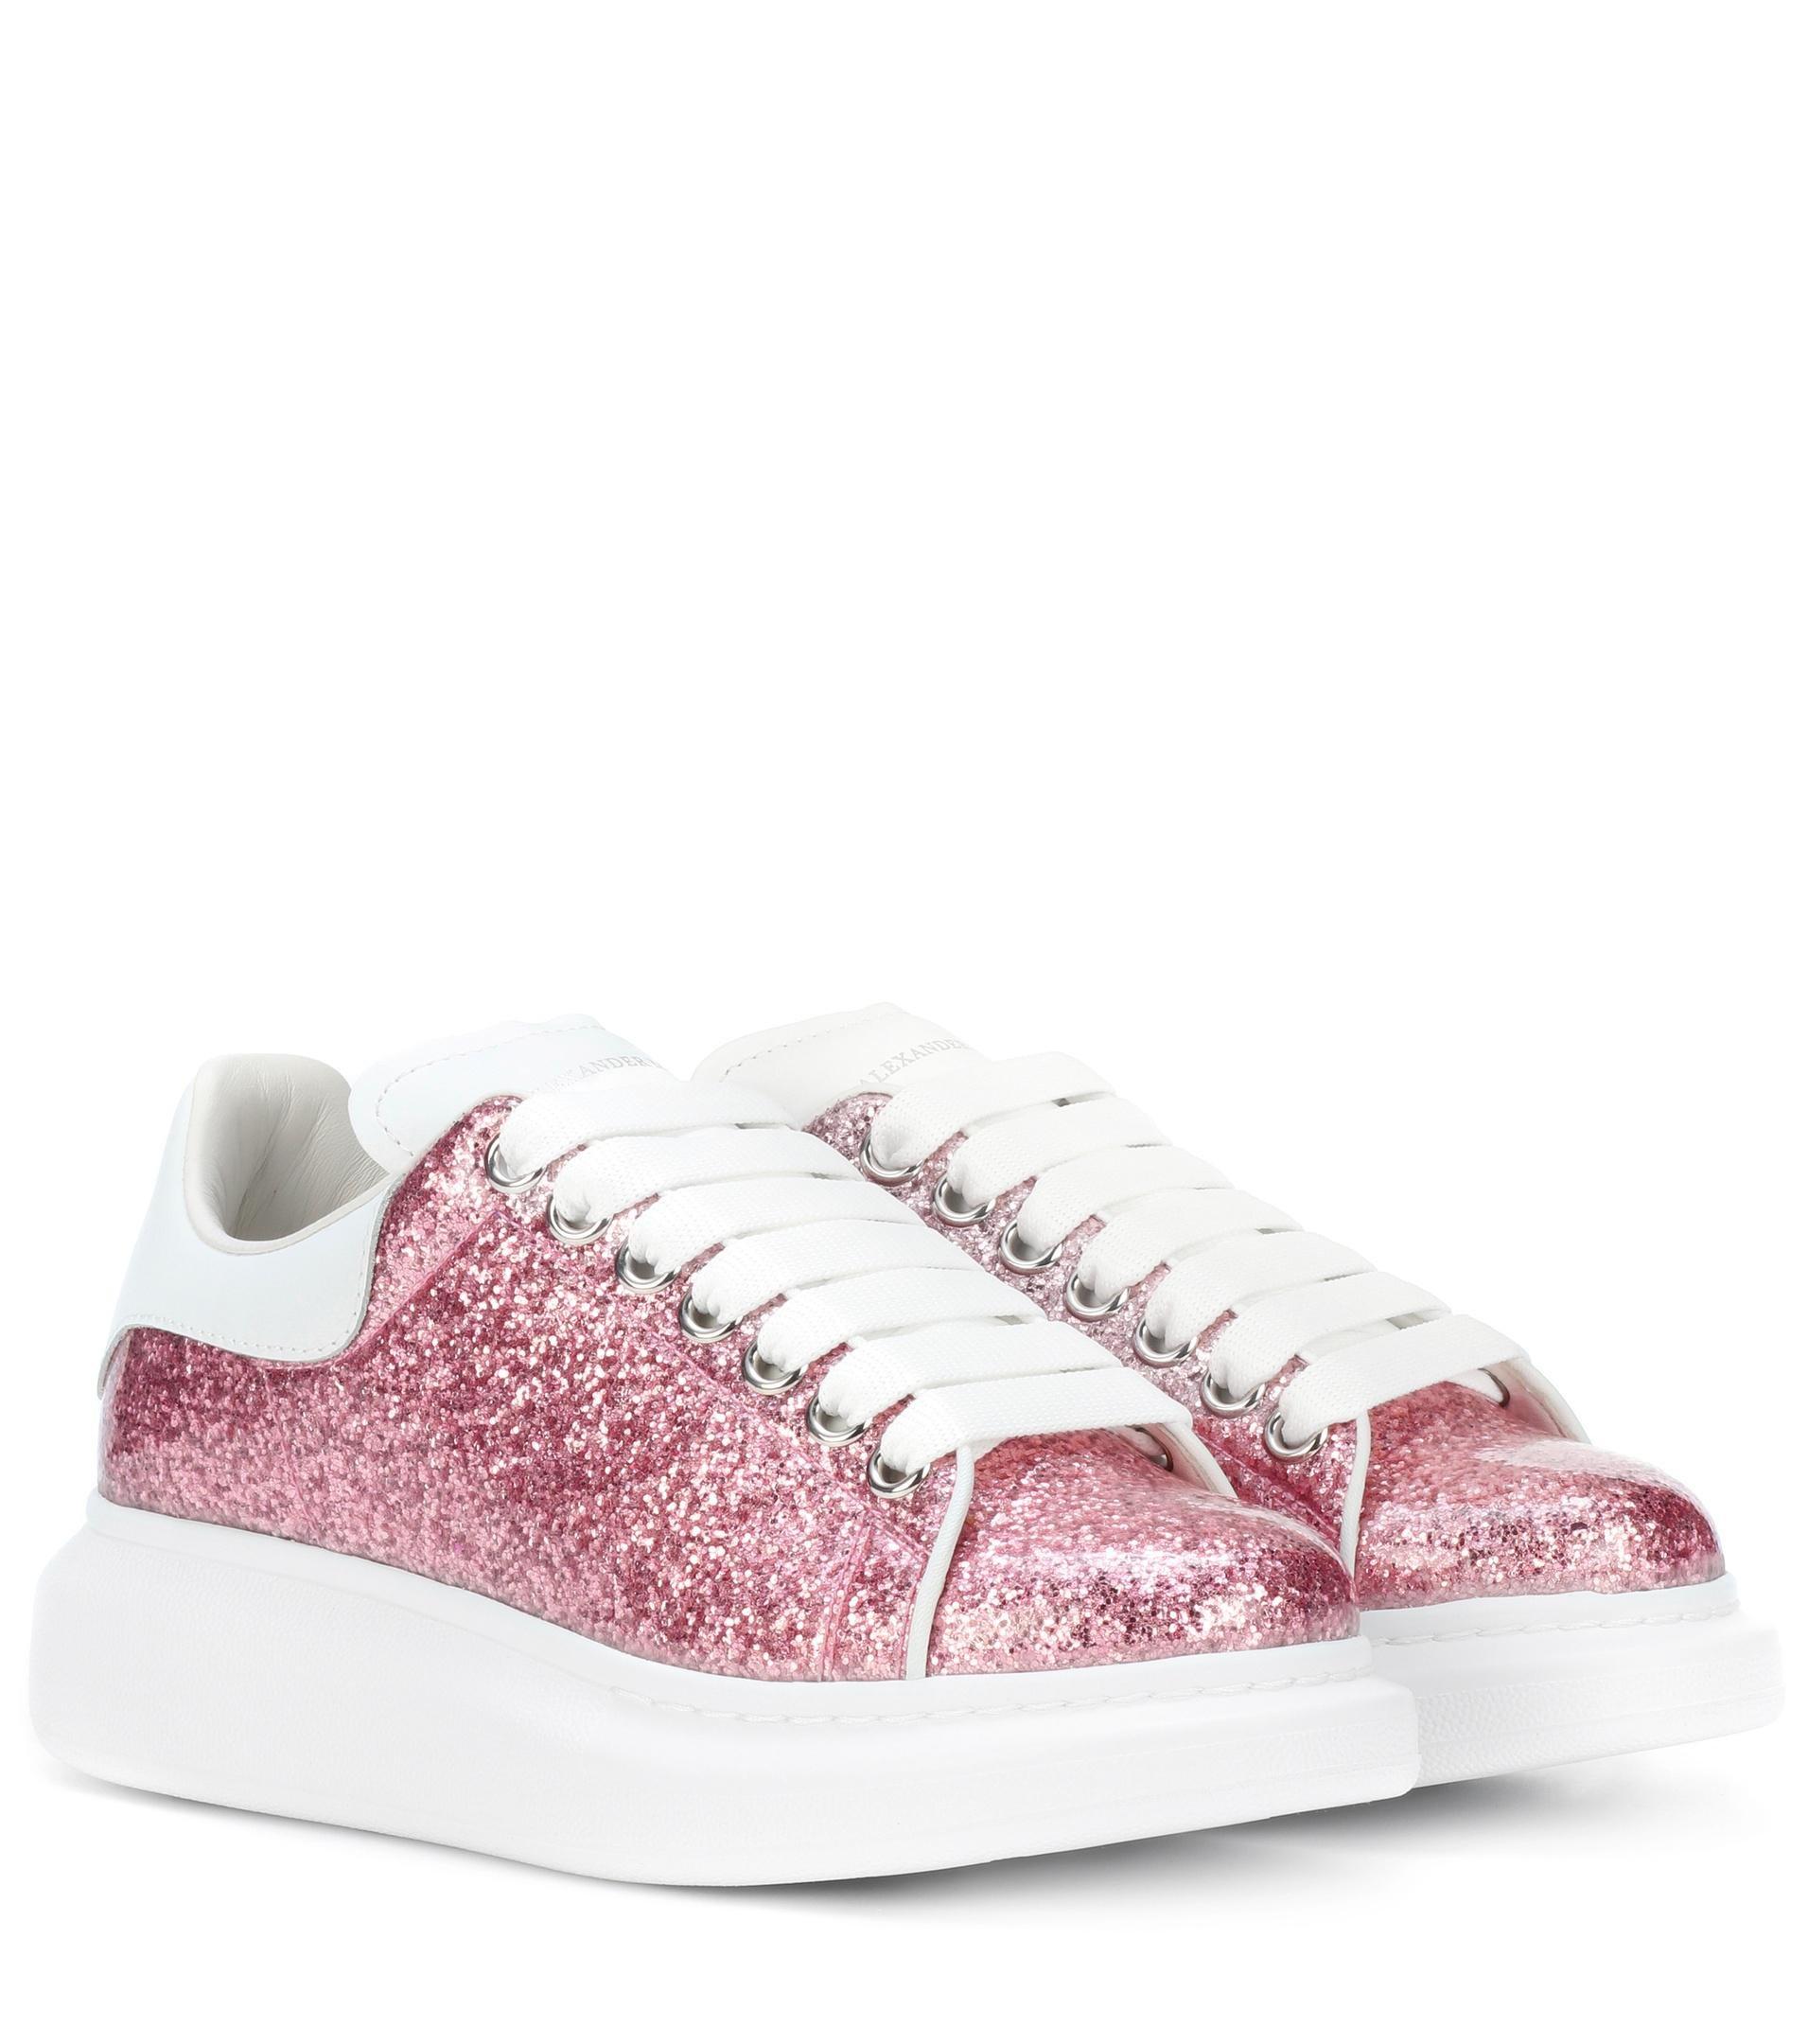 Alexander McQueen Pink Glitter Platform Leather Sneakers